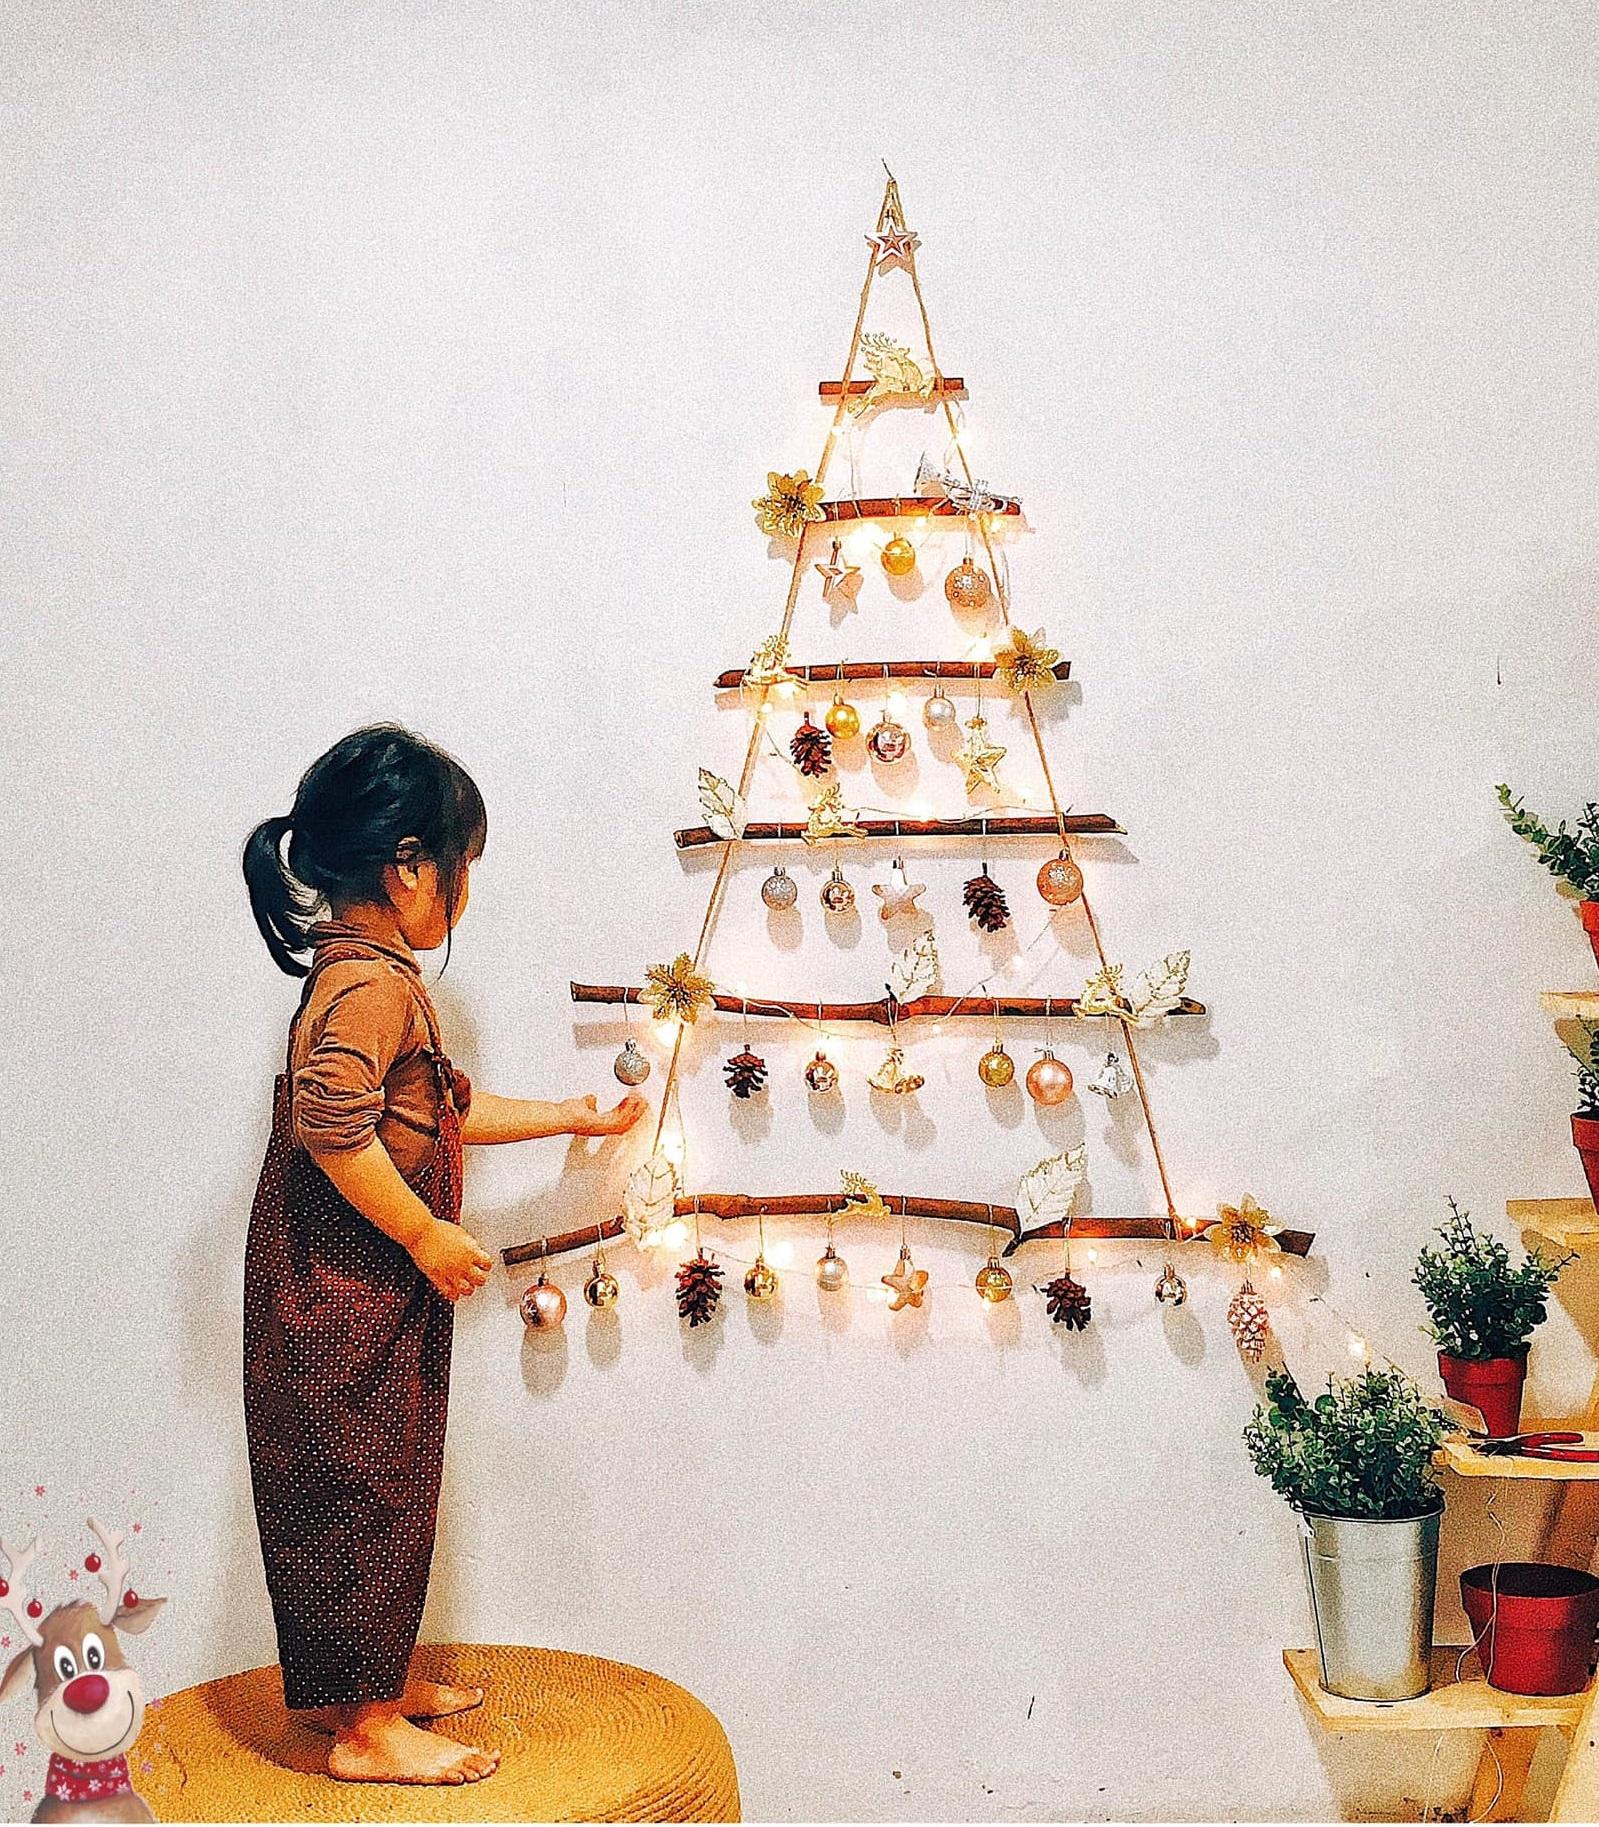 trang trí Noel 4